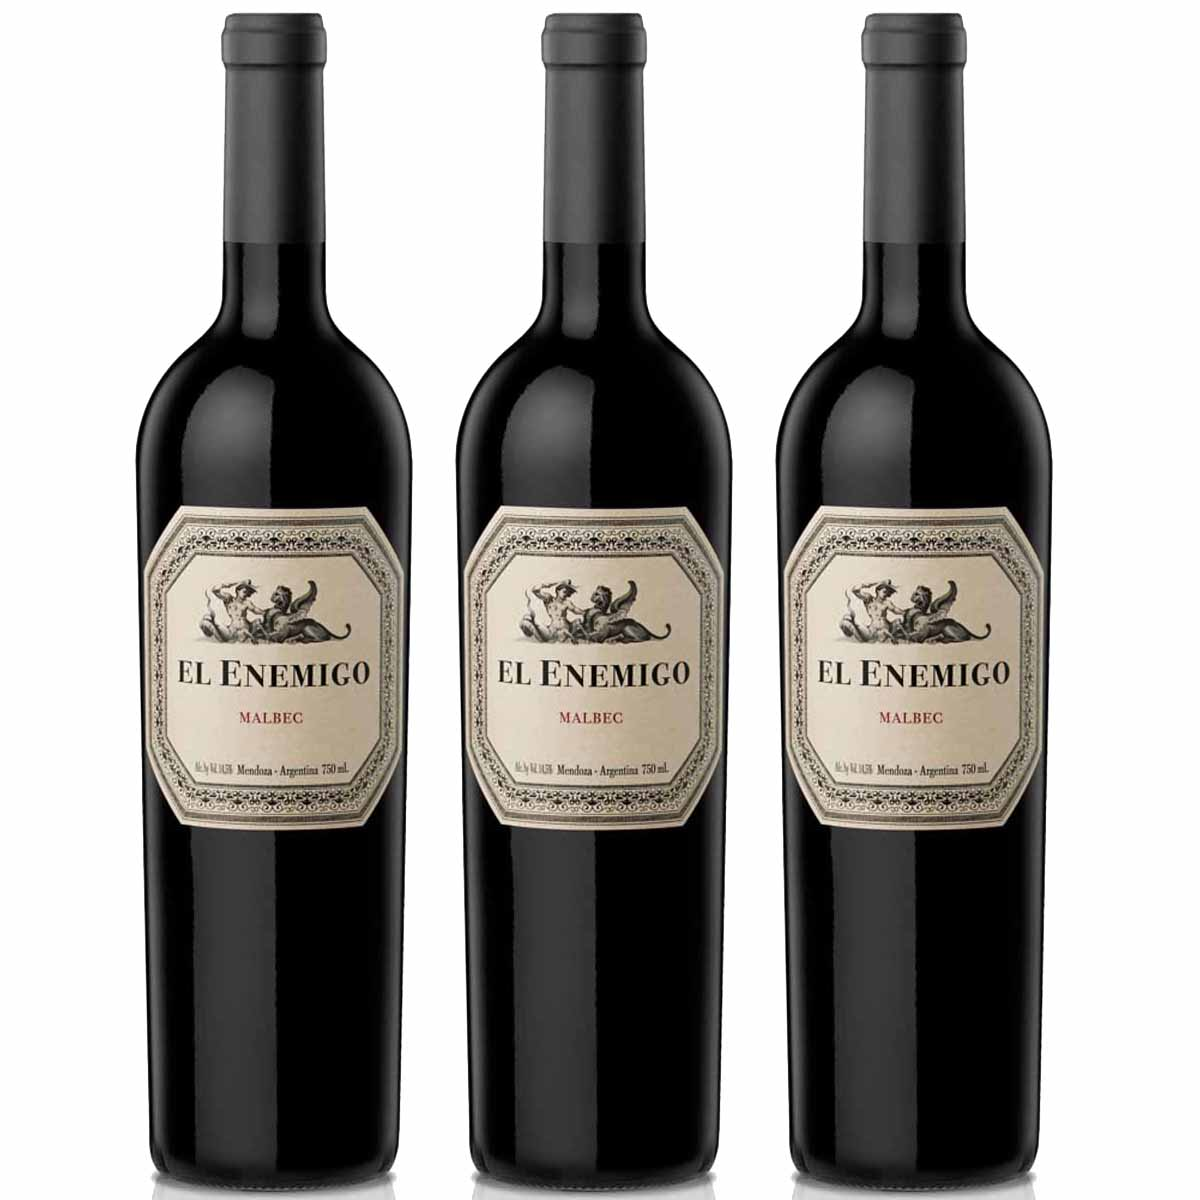 Kit 3 Vinhos Argentino Tinto El Enemigo Malbec 2016 Catena Zapata